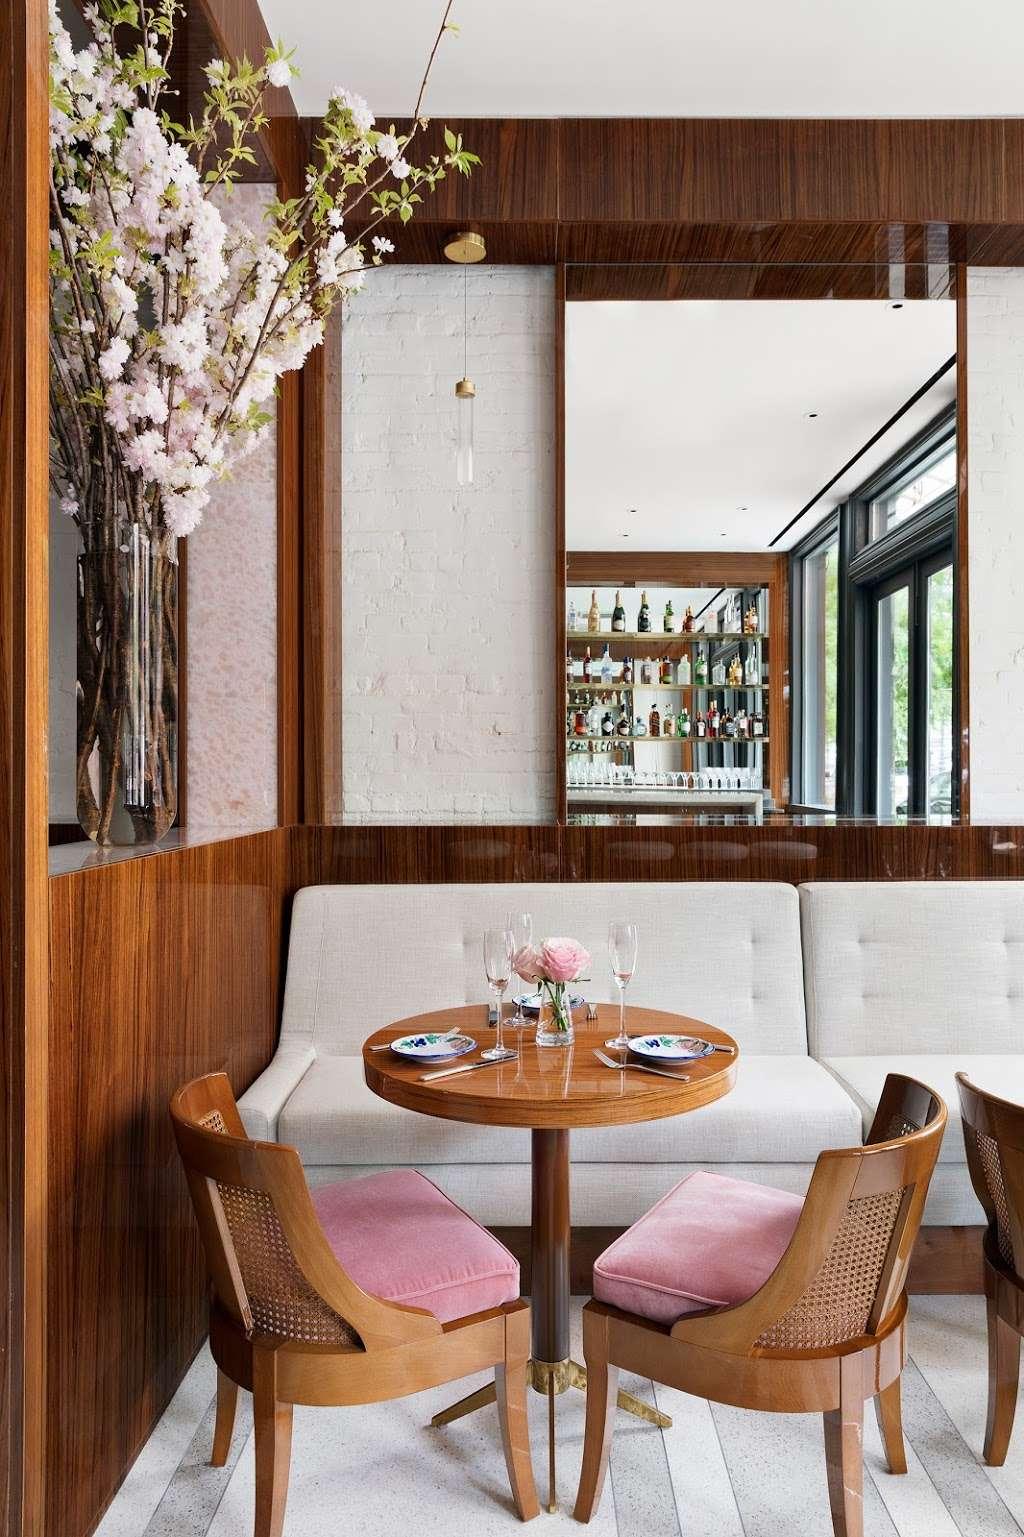 Bellini - restaurant  | Photo 9 of 10 | Address: 33 Peck Slip, New York, NY 10038, USA | Phone: (929) 263-0413